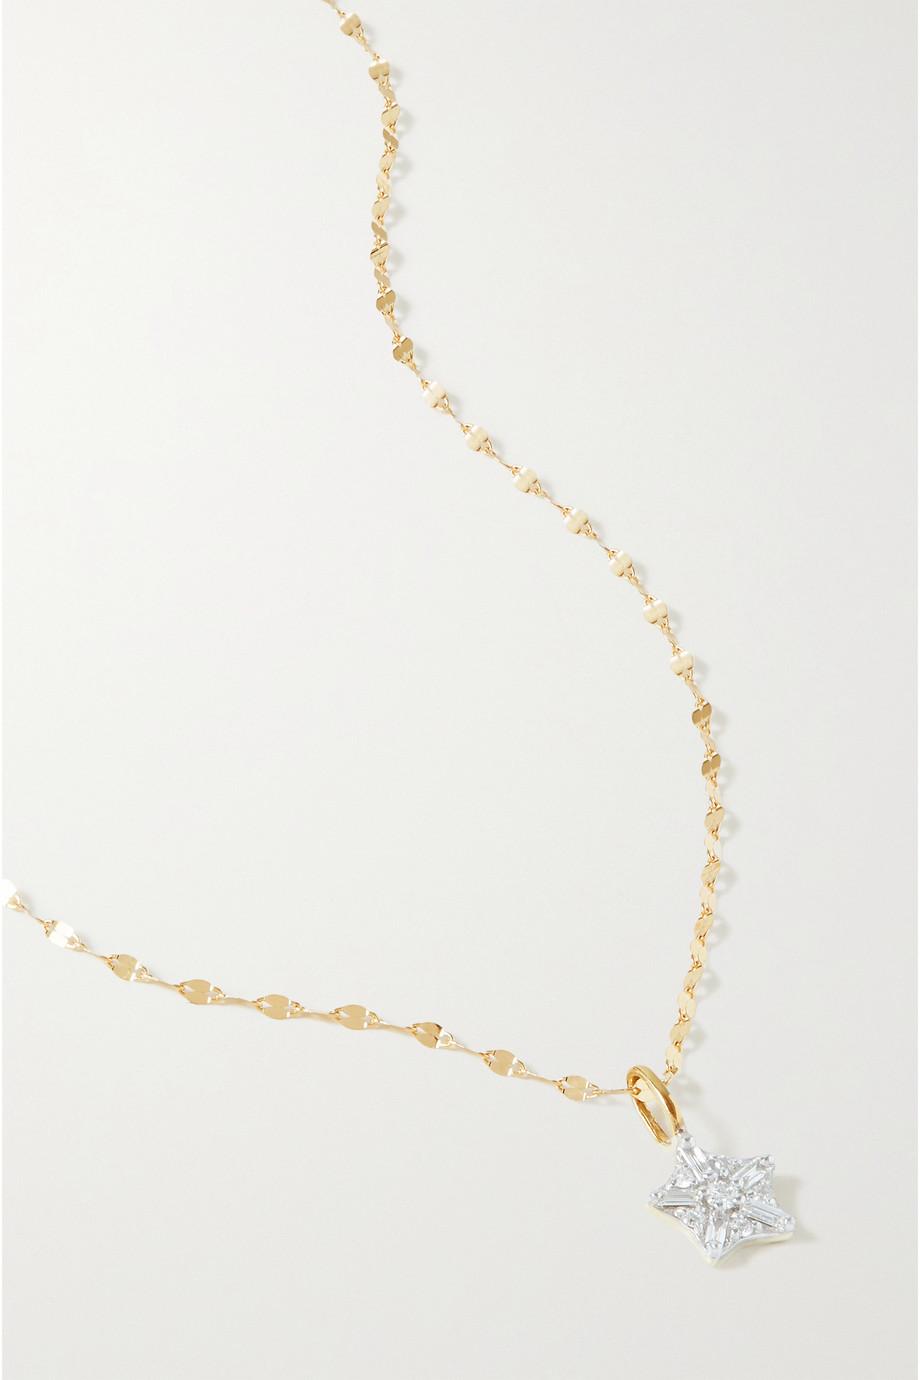 STONE AND STRAND Starbright Kette aus Gold mit Diamanten